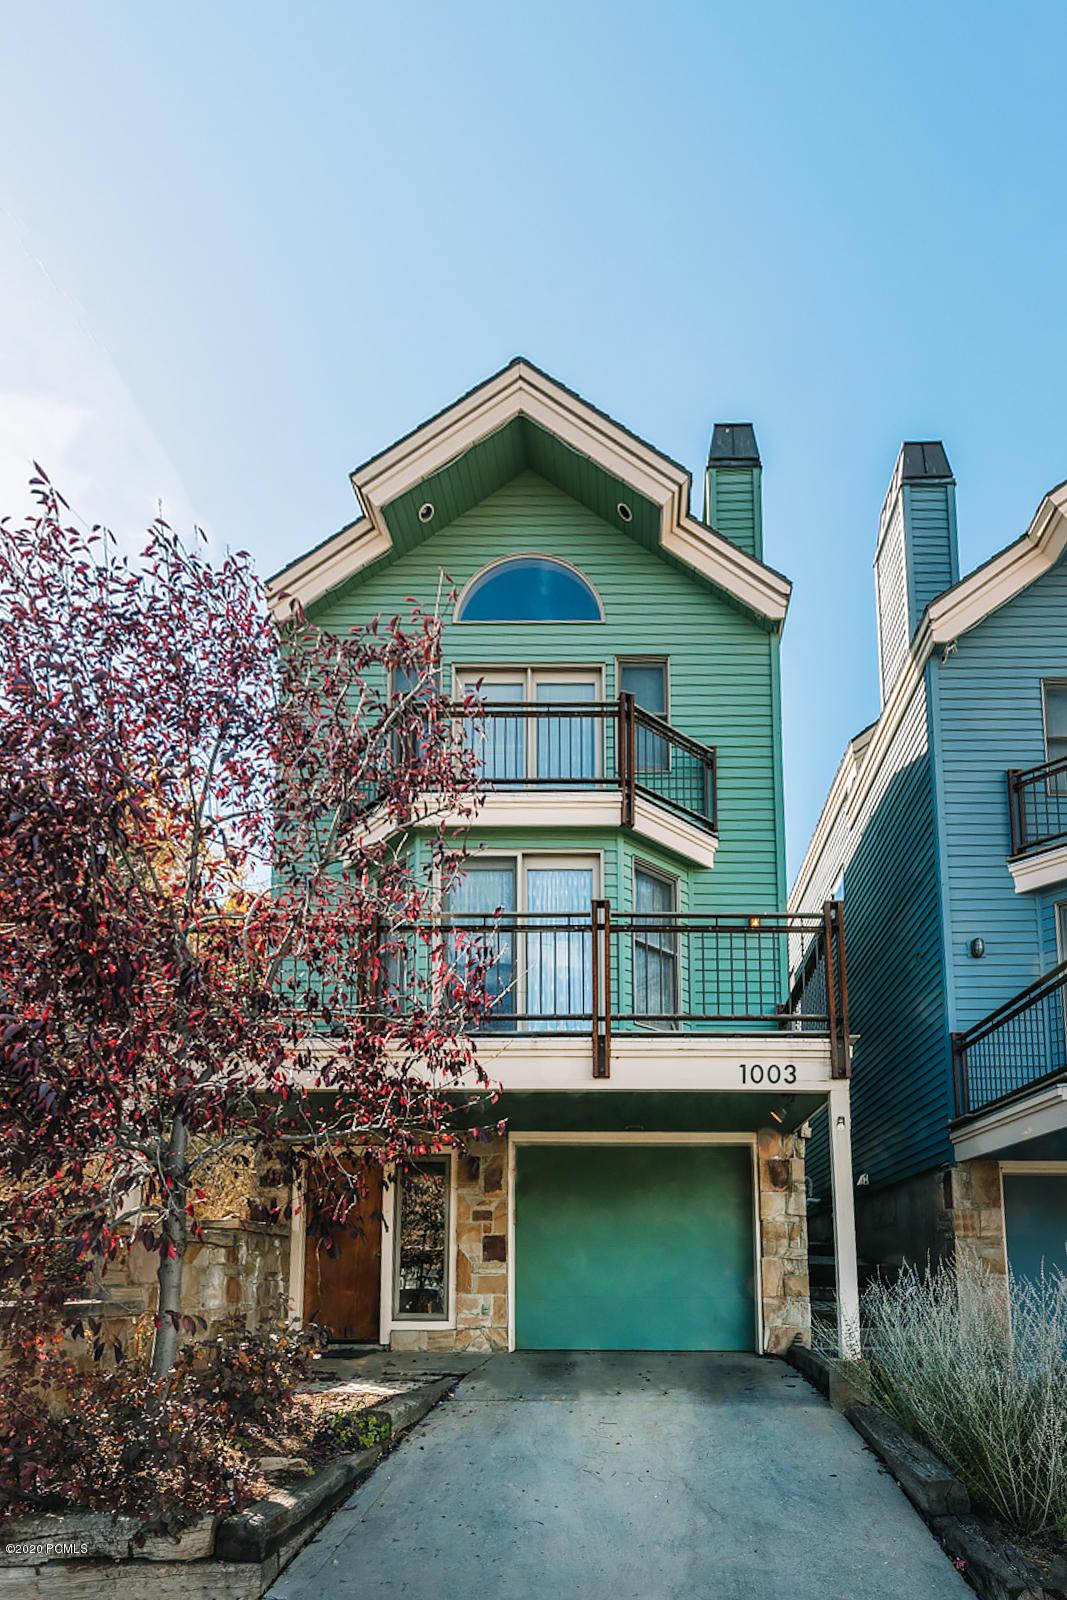 1003 Empire Avenue, Park City, Utah 84060, 3 Bedrooms Bedrooms, ,2 BathroomsBathrooms,Single Family,For Sale,Empire,12004095